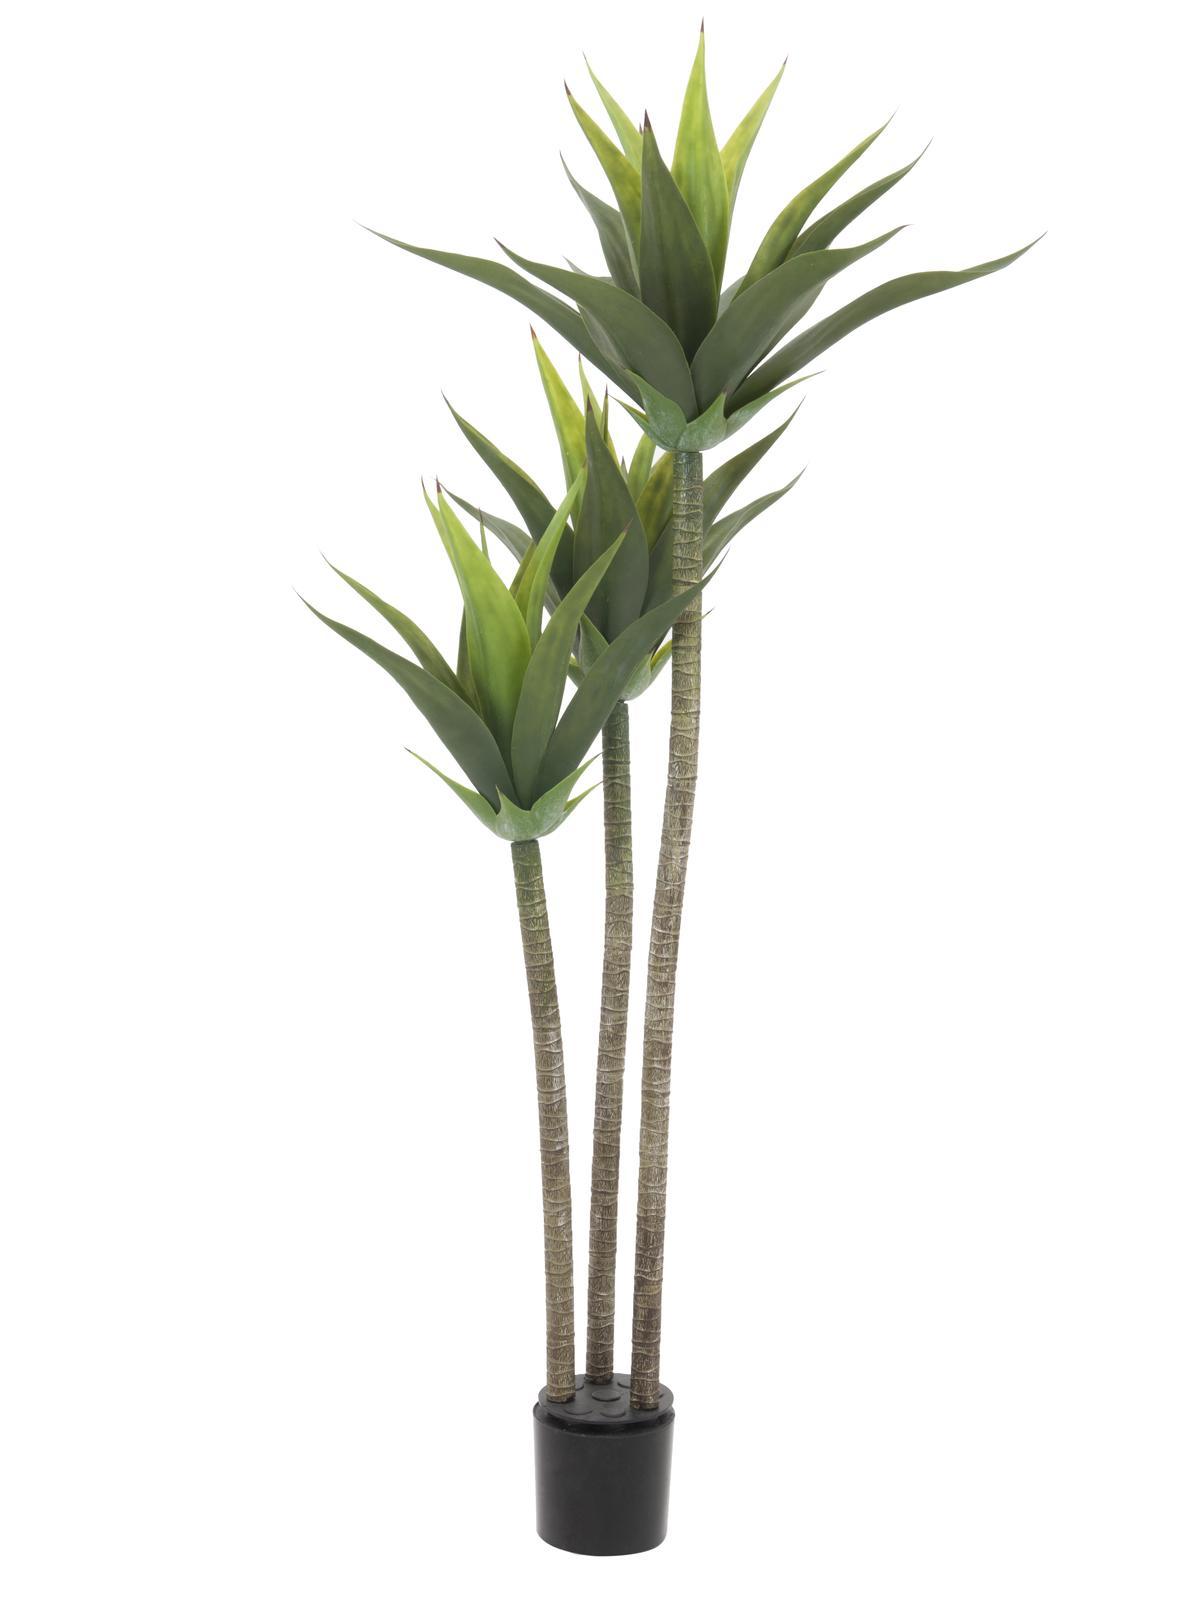 EUROPALMS Yucca, 3 tronchi, 125cm